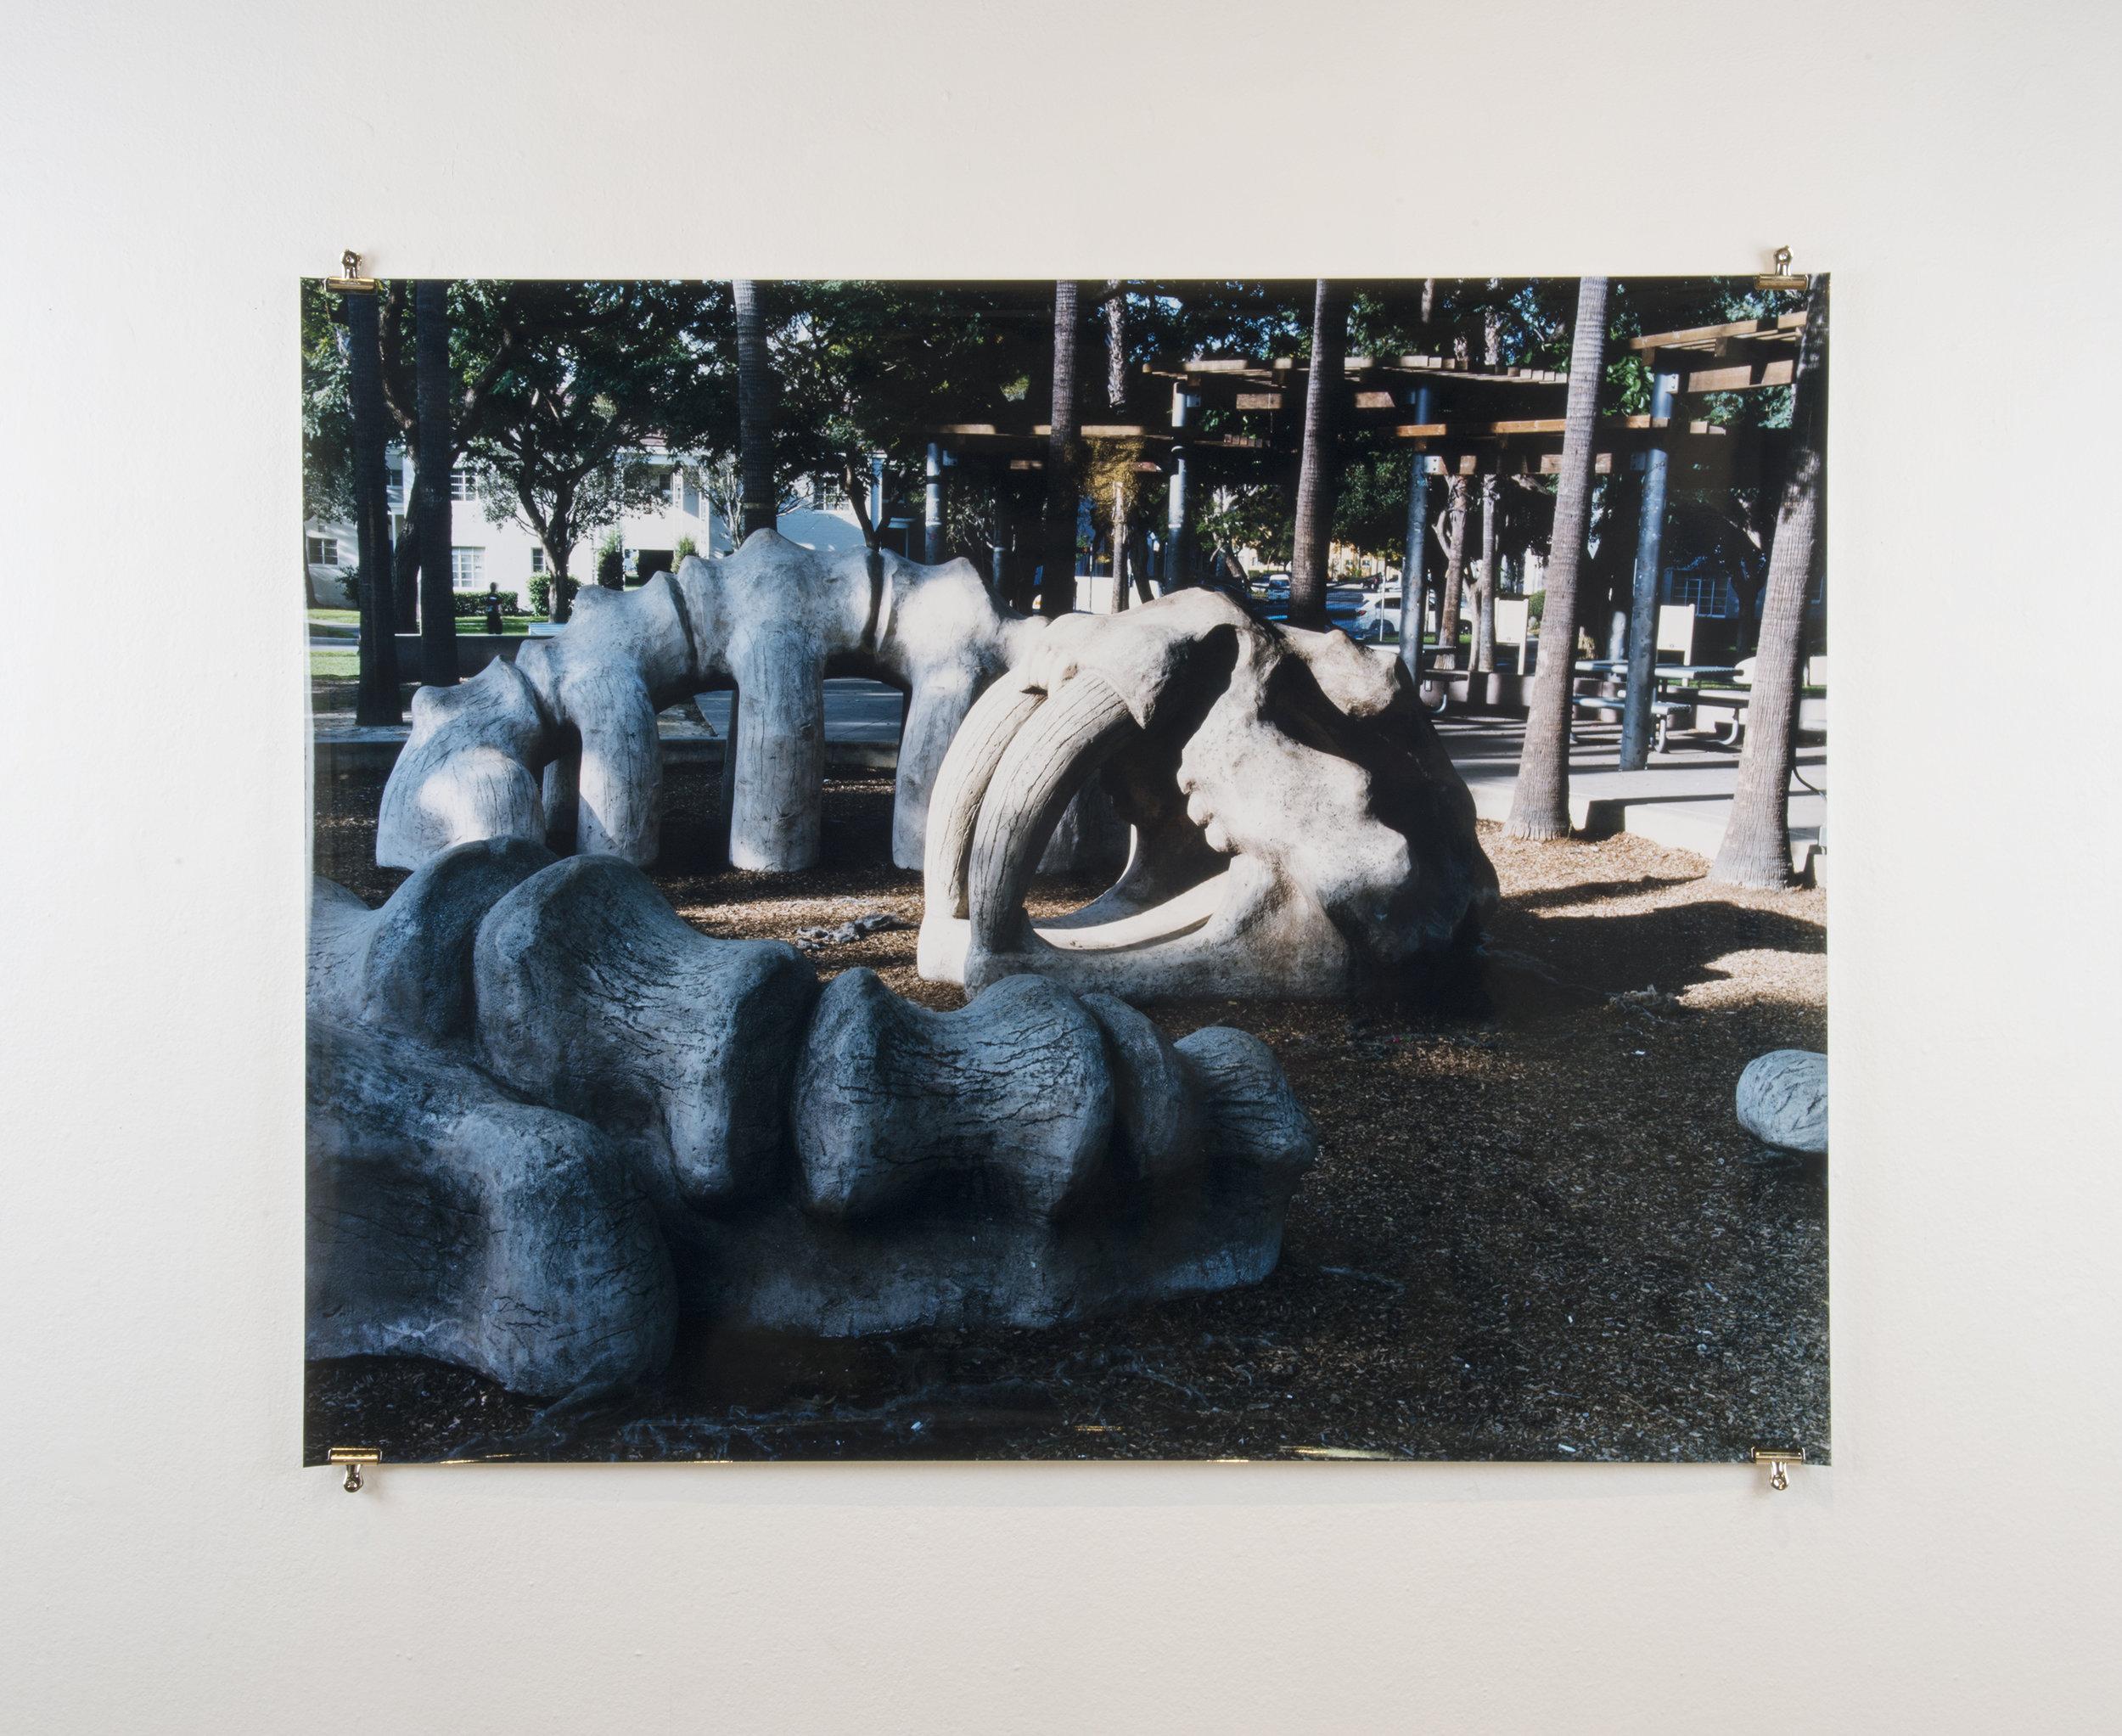 Playground, 50in x 62in, Chromogenic Print.